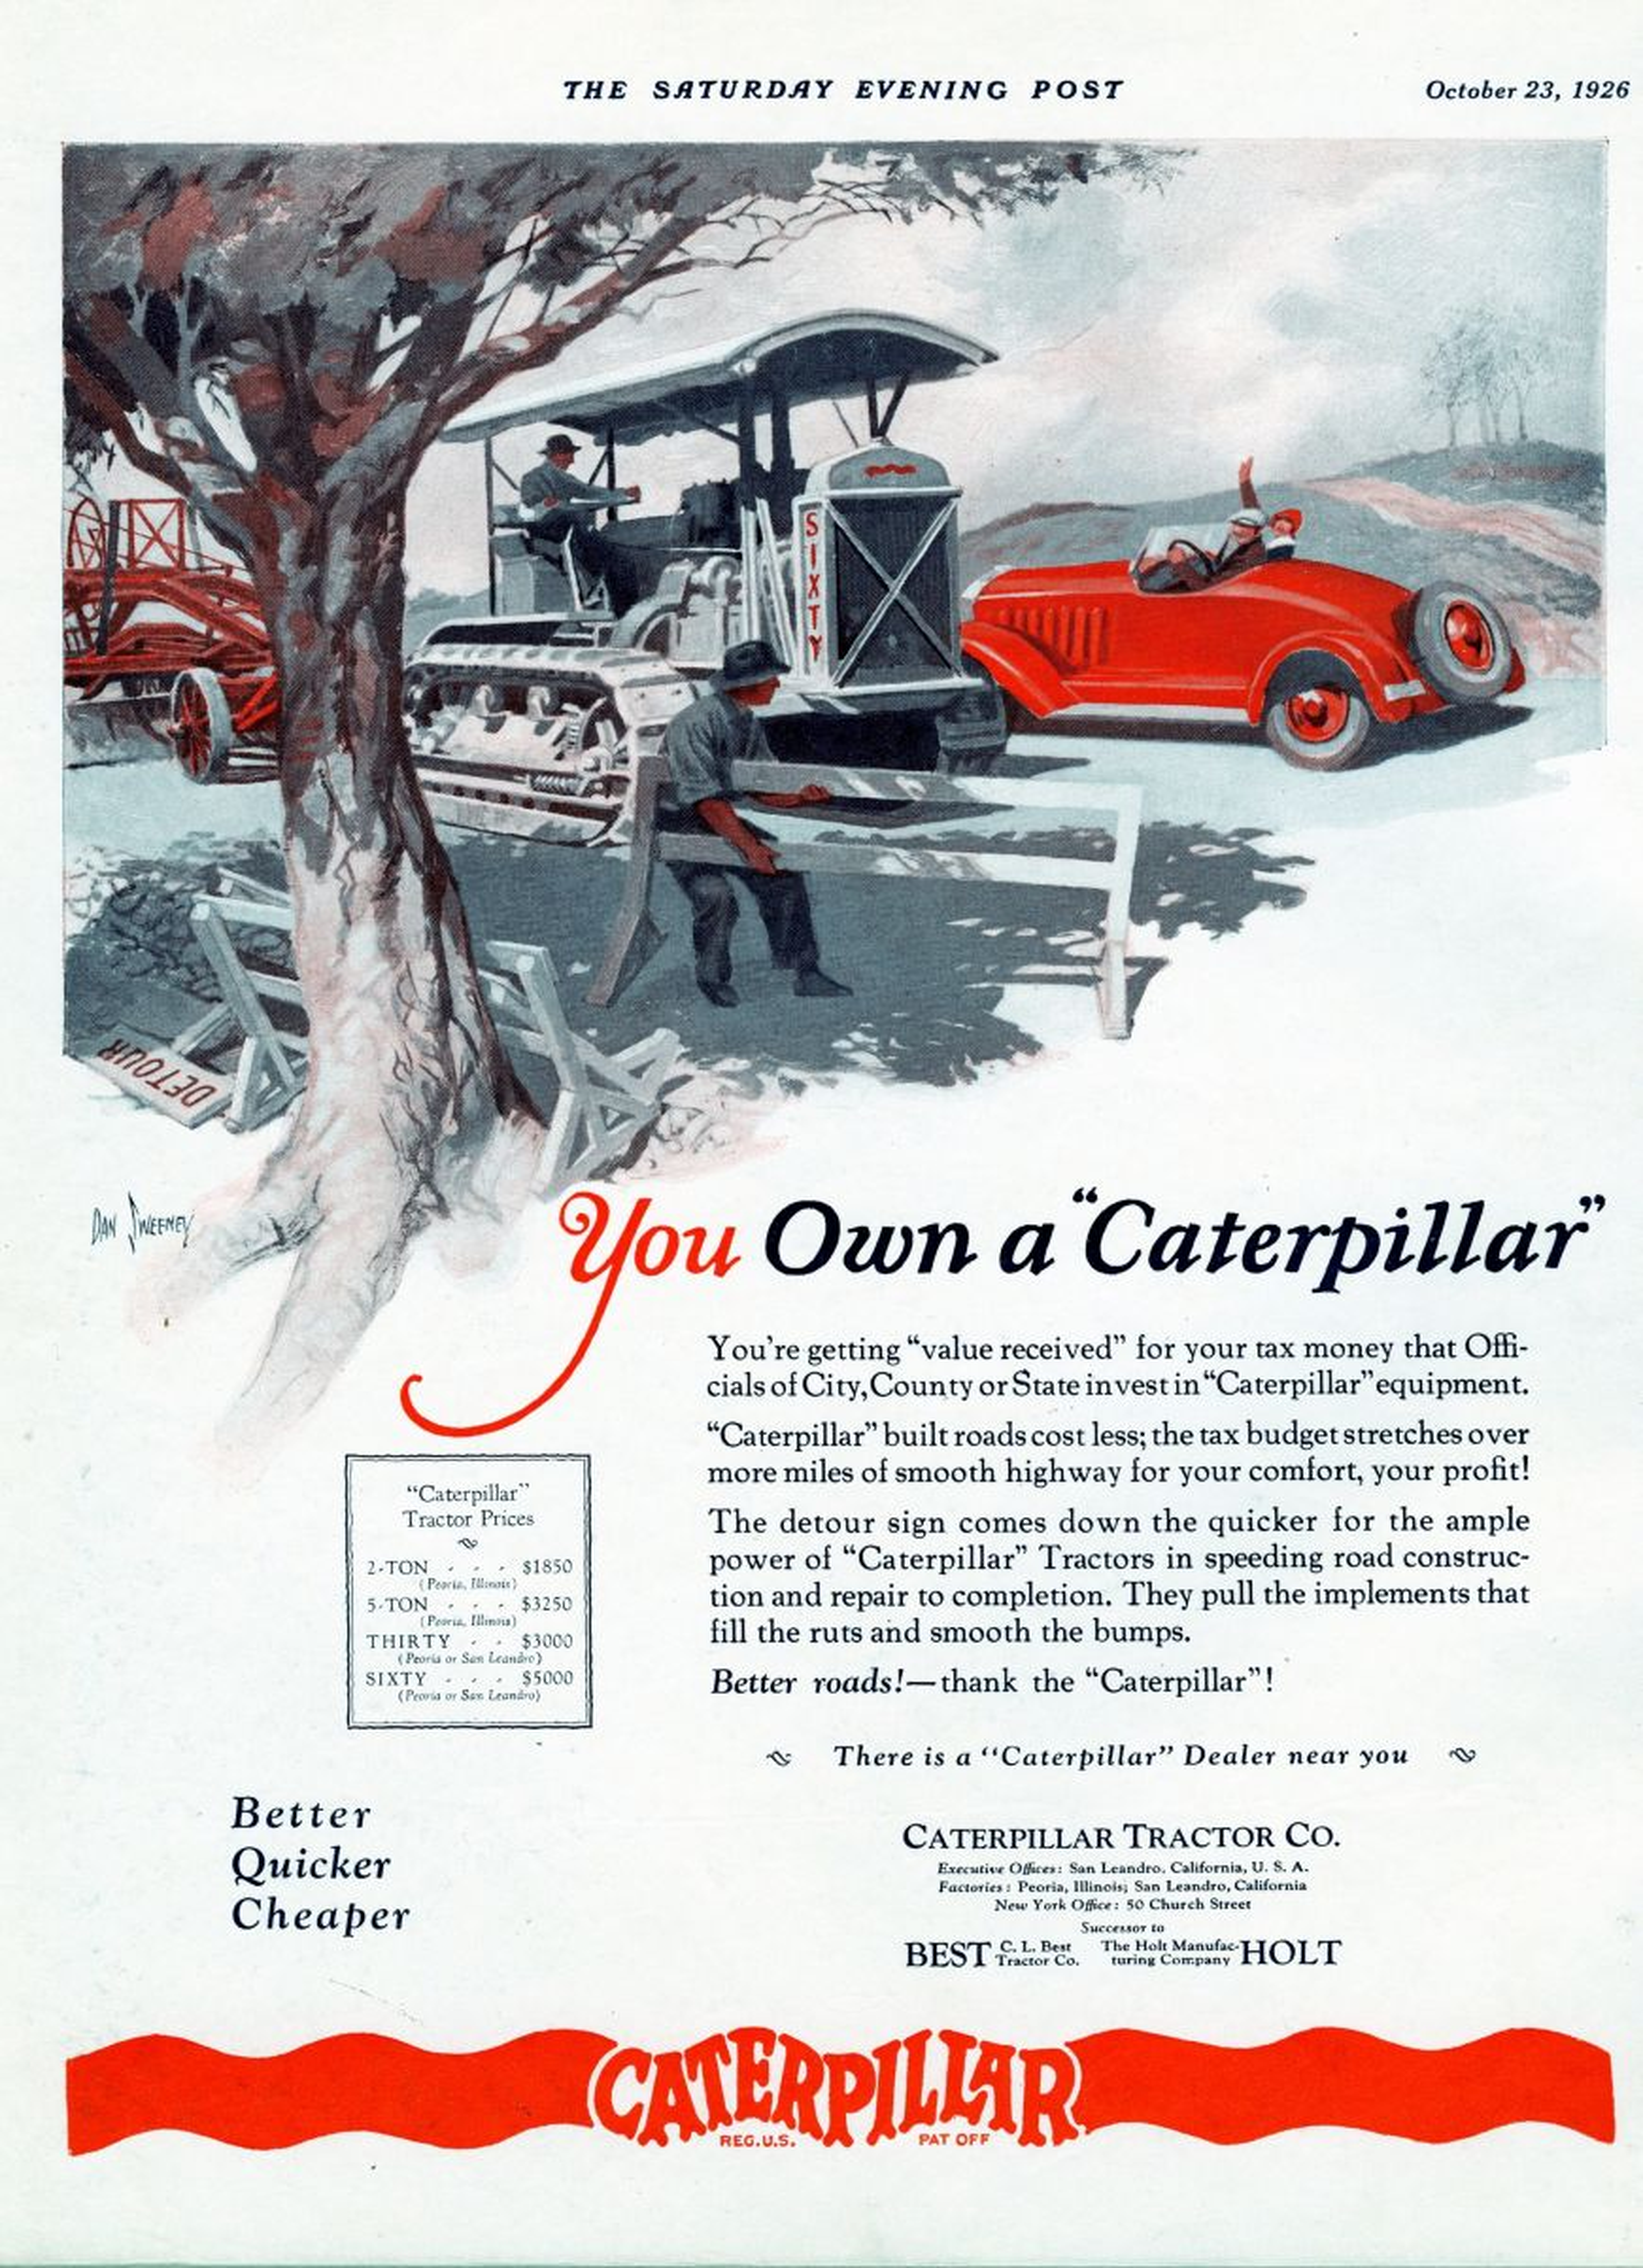 Caterpillar Tractor Co. advertisement, 1926